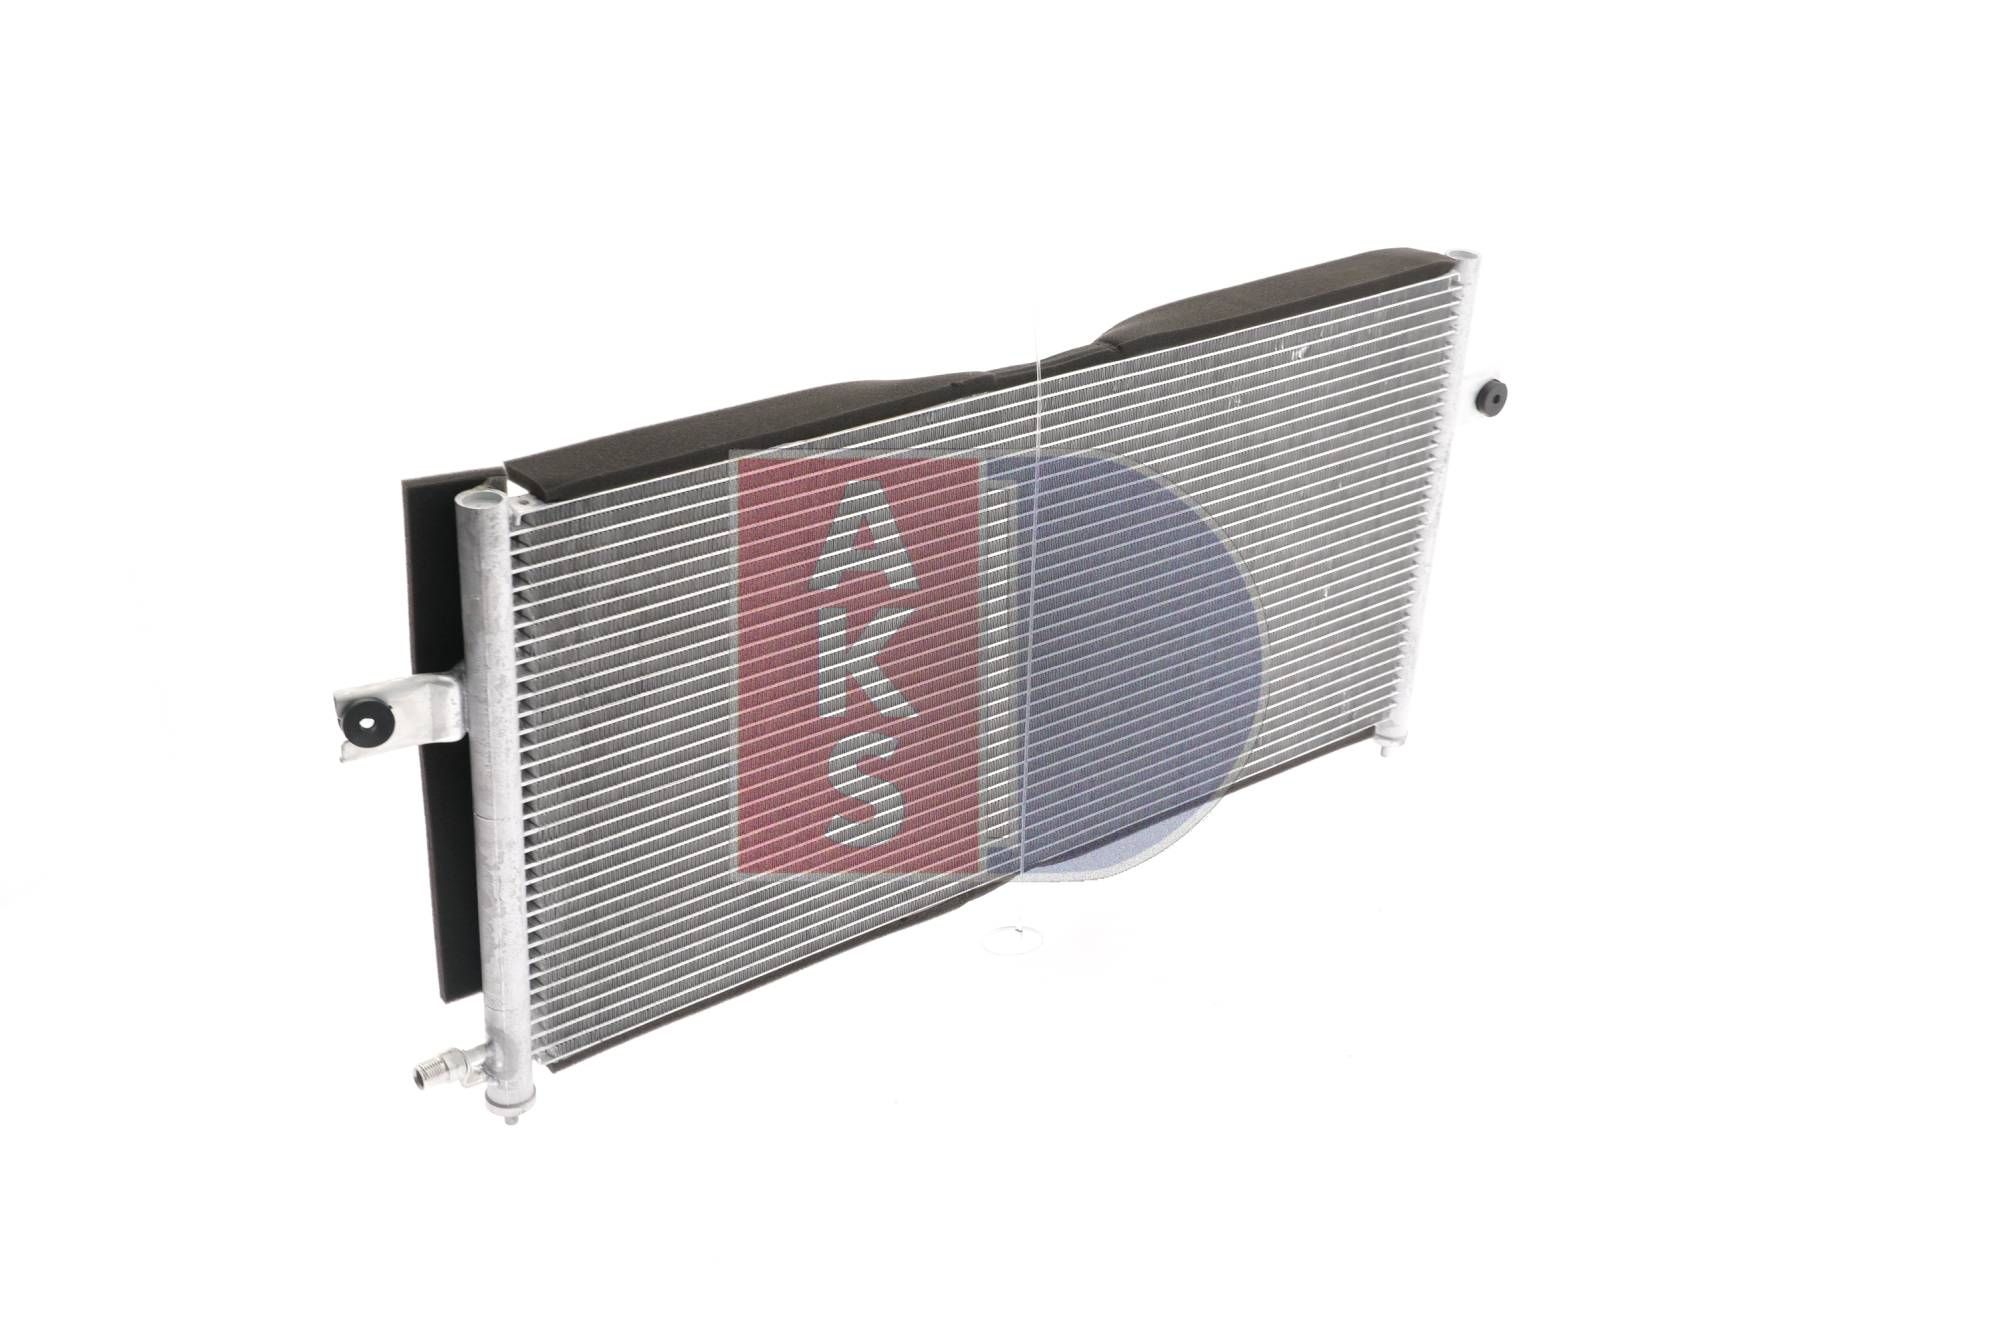 Klimakondensator 092007N AKS DASIS 092007N in Original Qualität